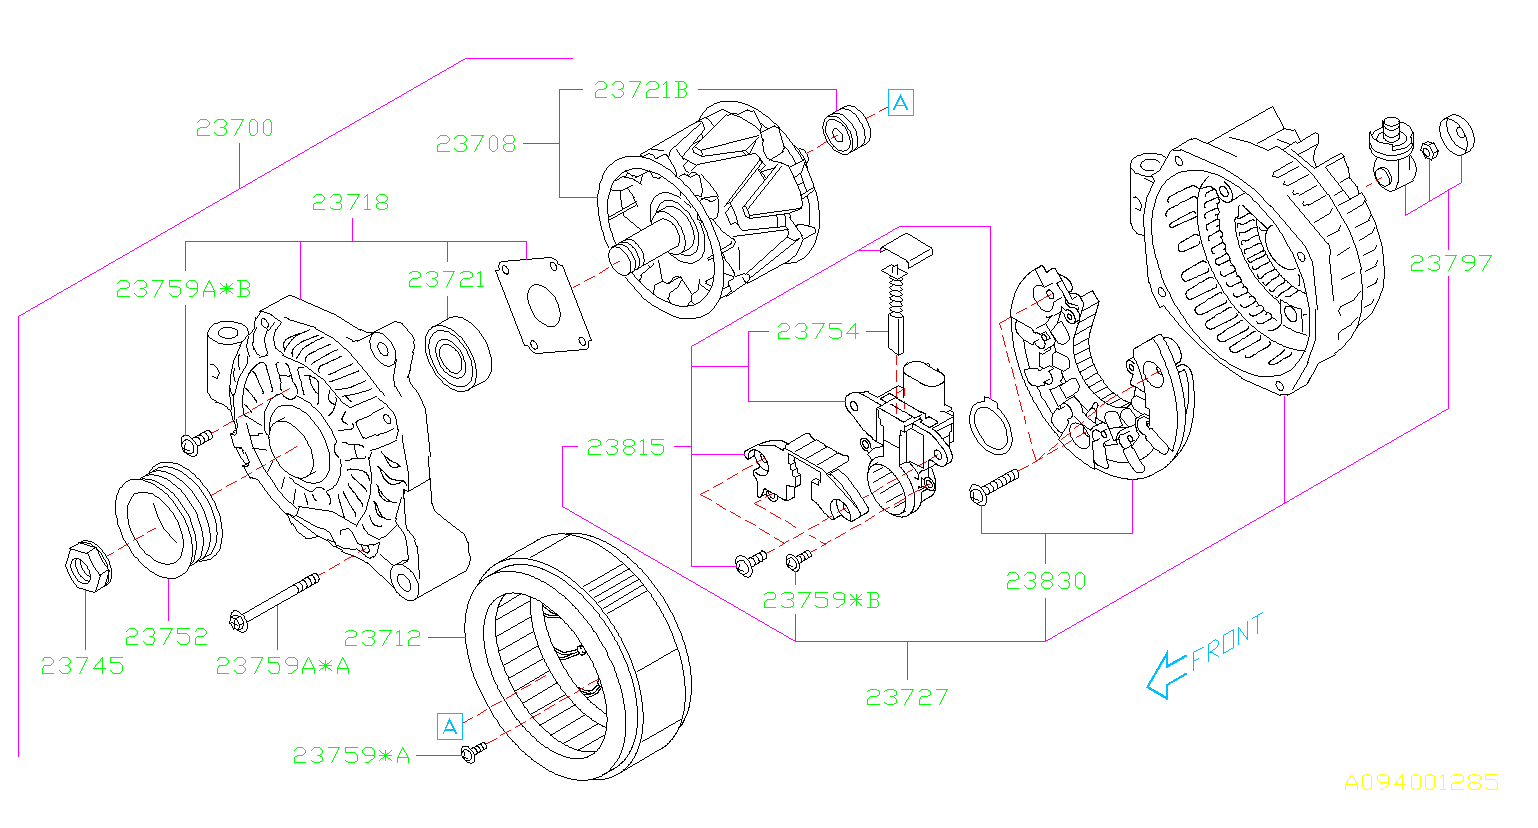 Subaru Forester Alternator  System  Battery  Body